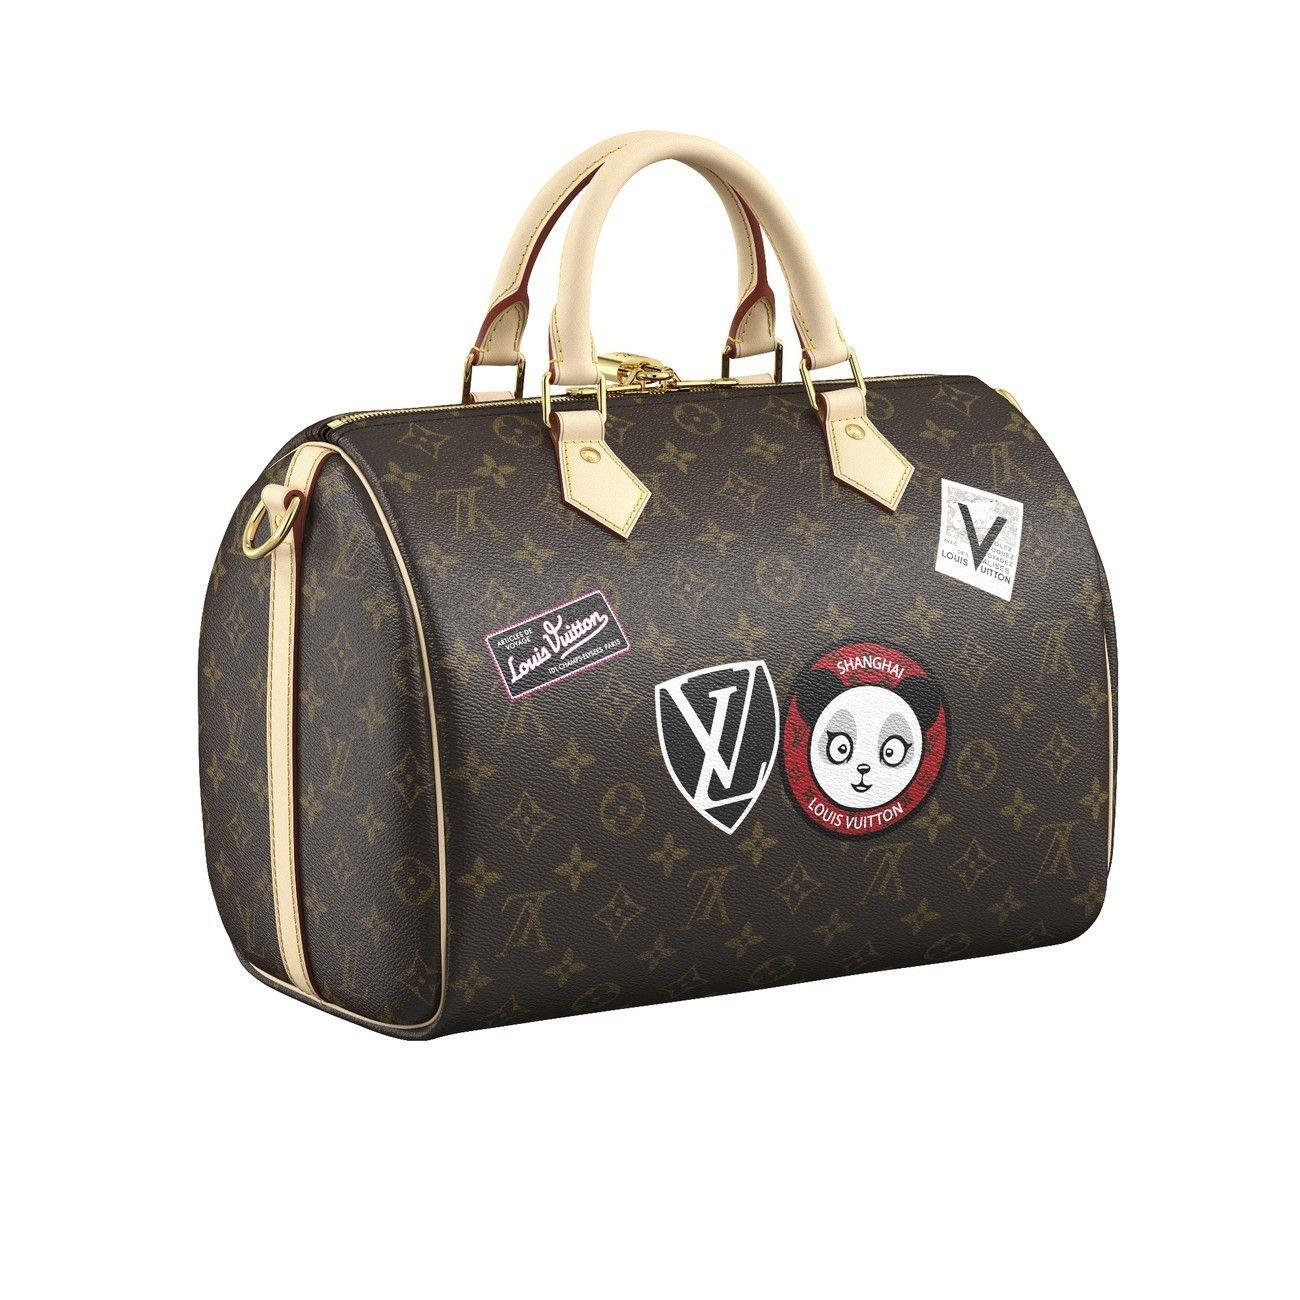 4ae4fbc0cf Speedy Bandoulière 30 MY LV WORLD TOUR in 2019 | Pretty handbags ...